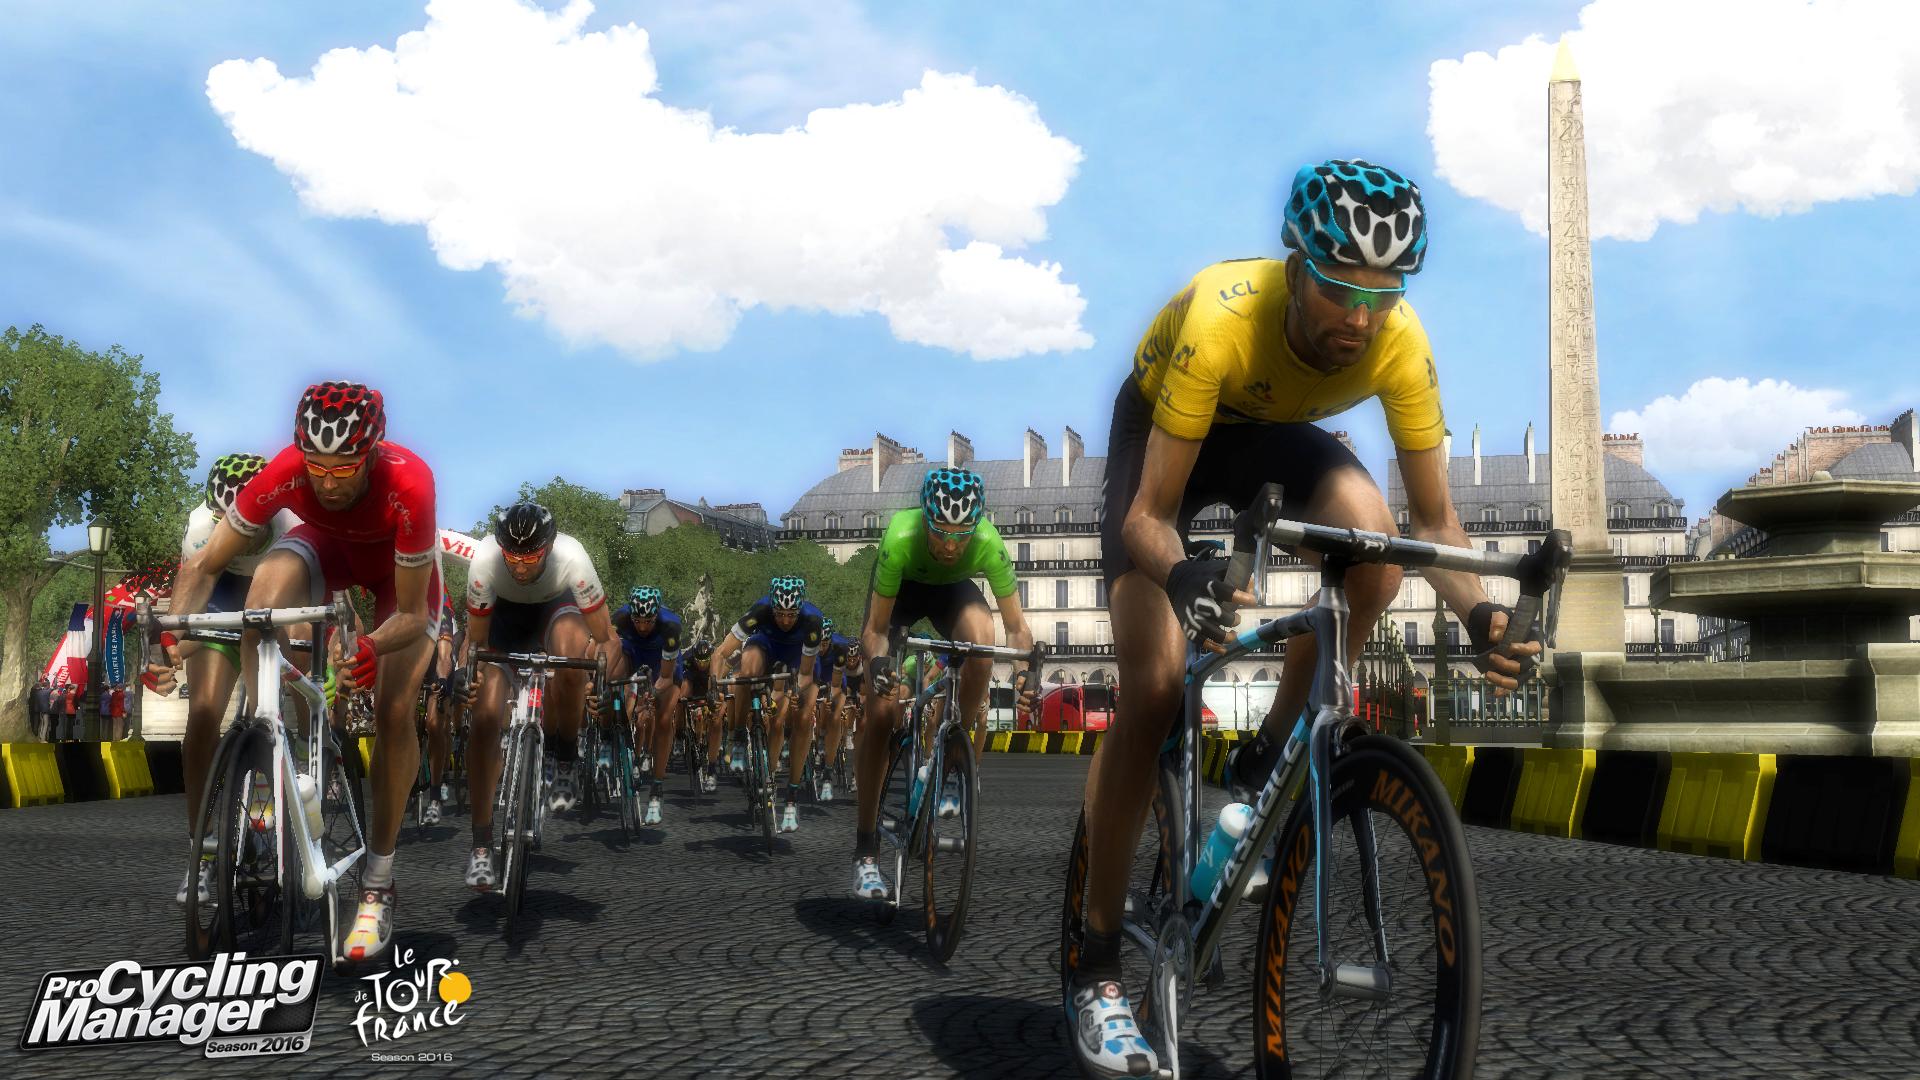 Pro Cycling Manager 2016 ESPAÑOL PC Descargar Full (SKIDROW) + REPACK 1 DVD5 (JPW) 6